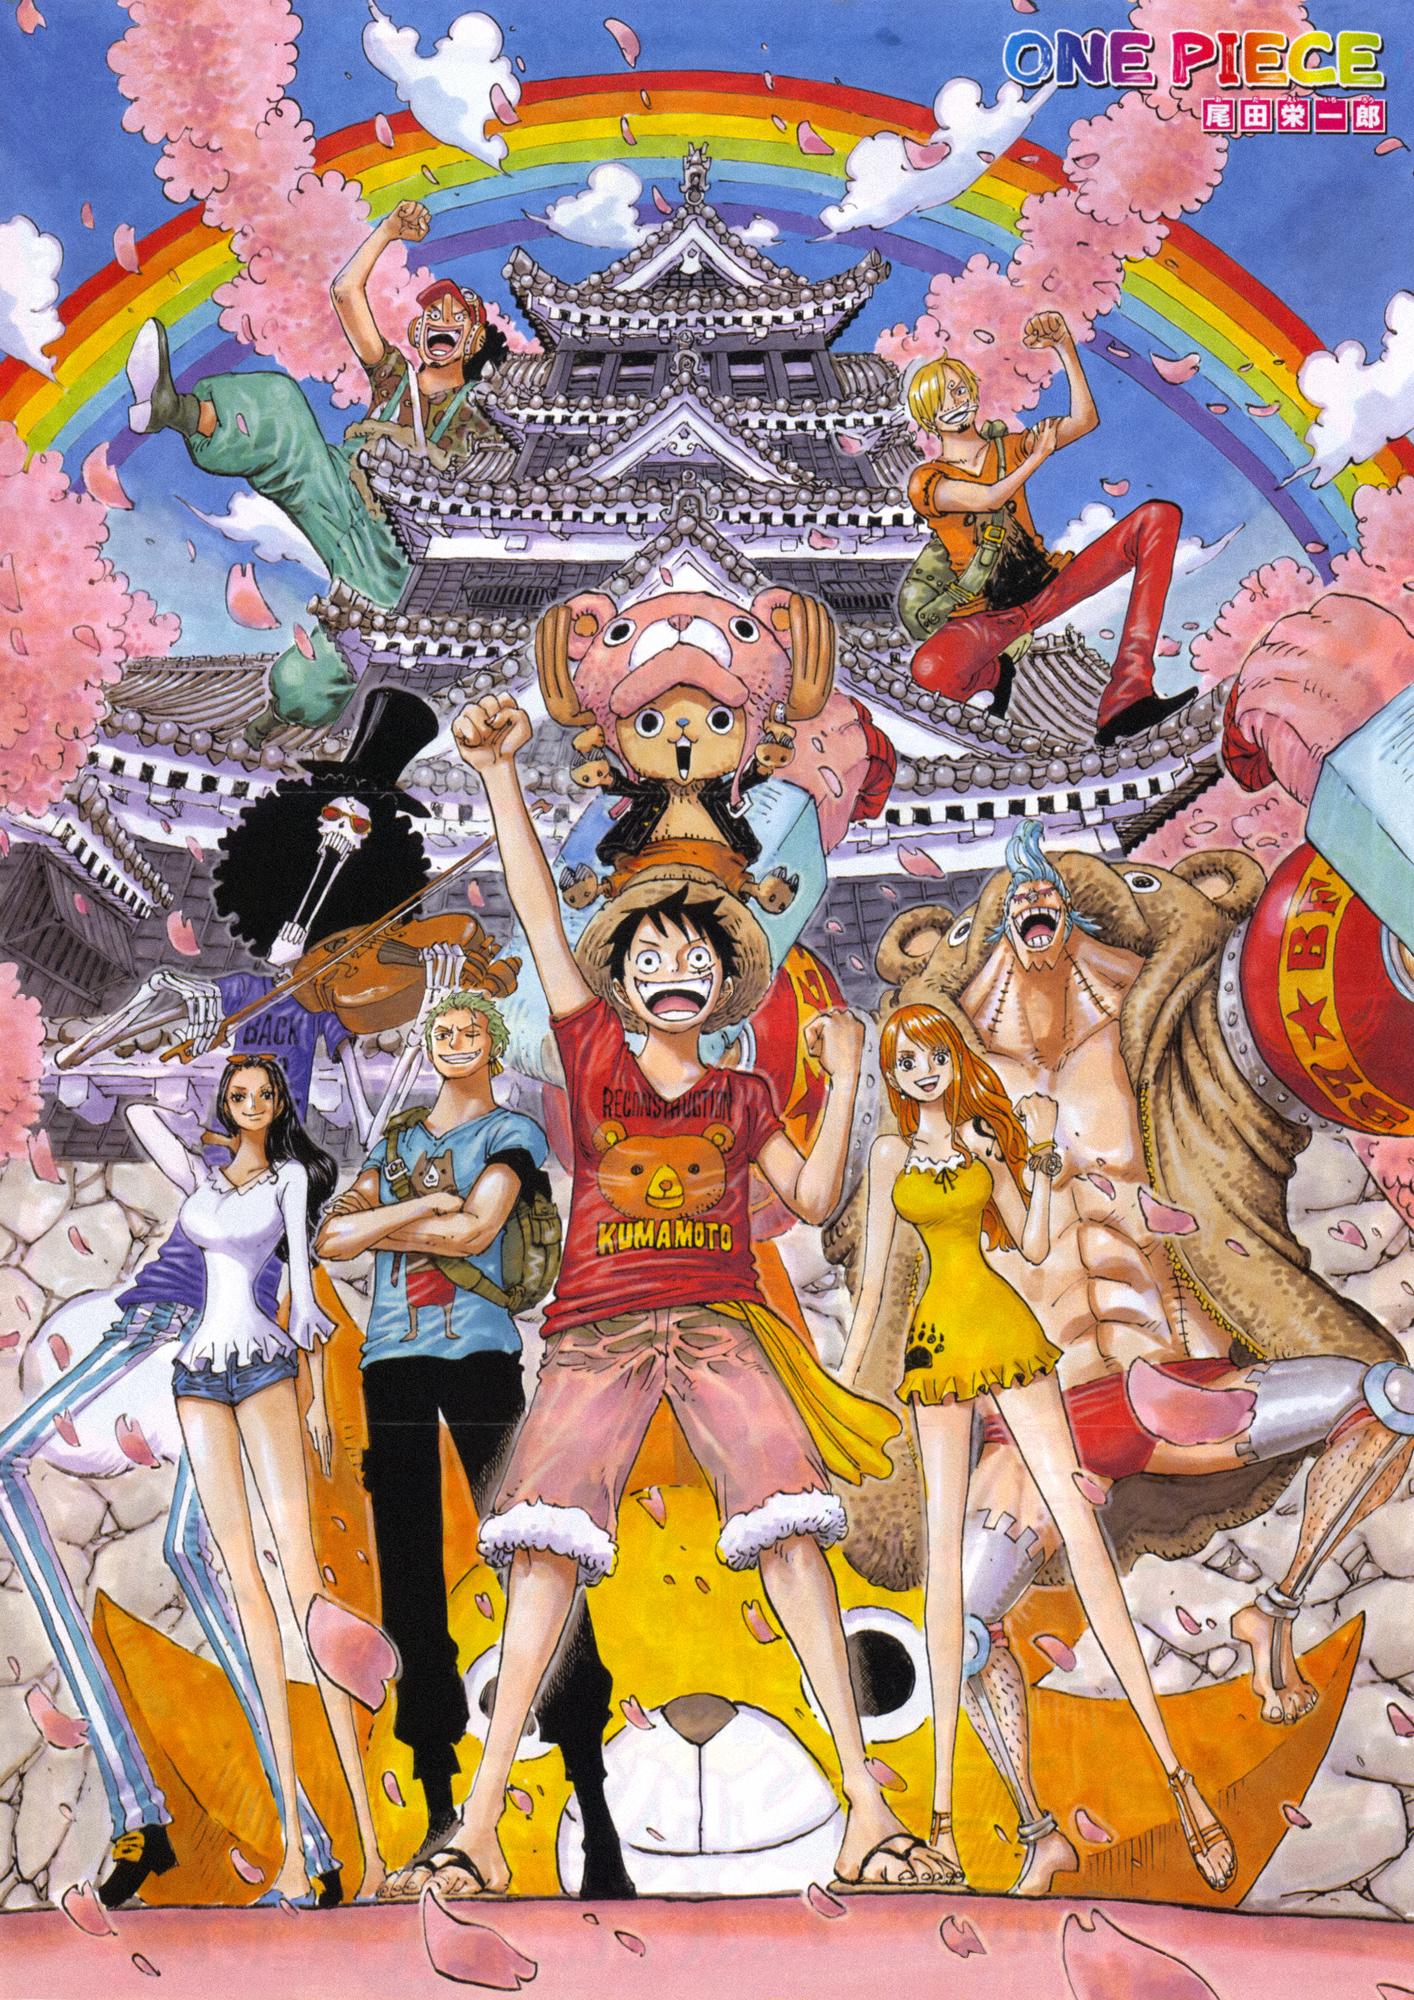 One Piece, Monkey D. Luffy, Sanji